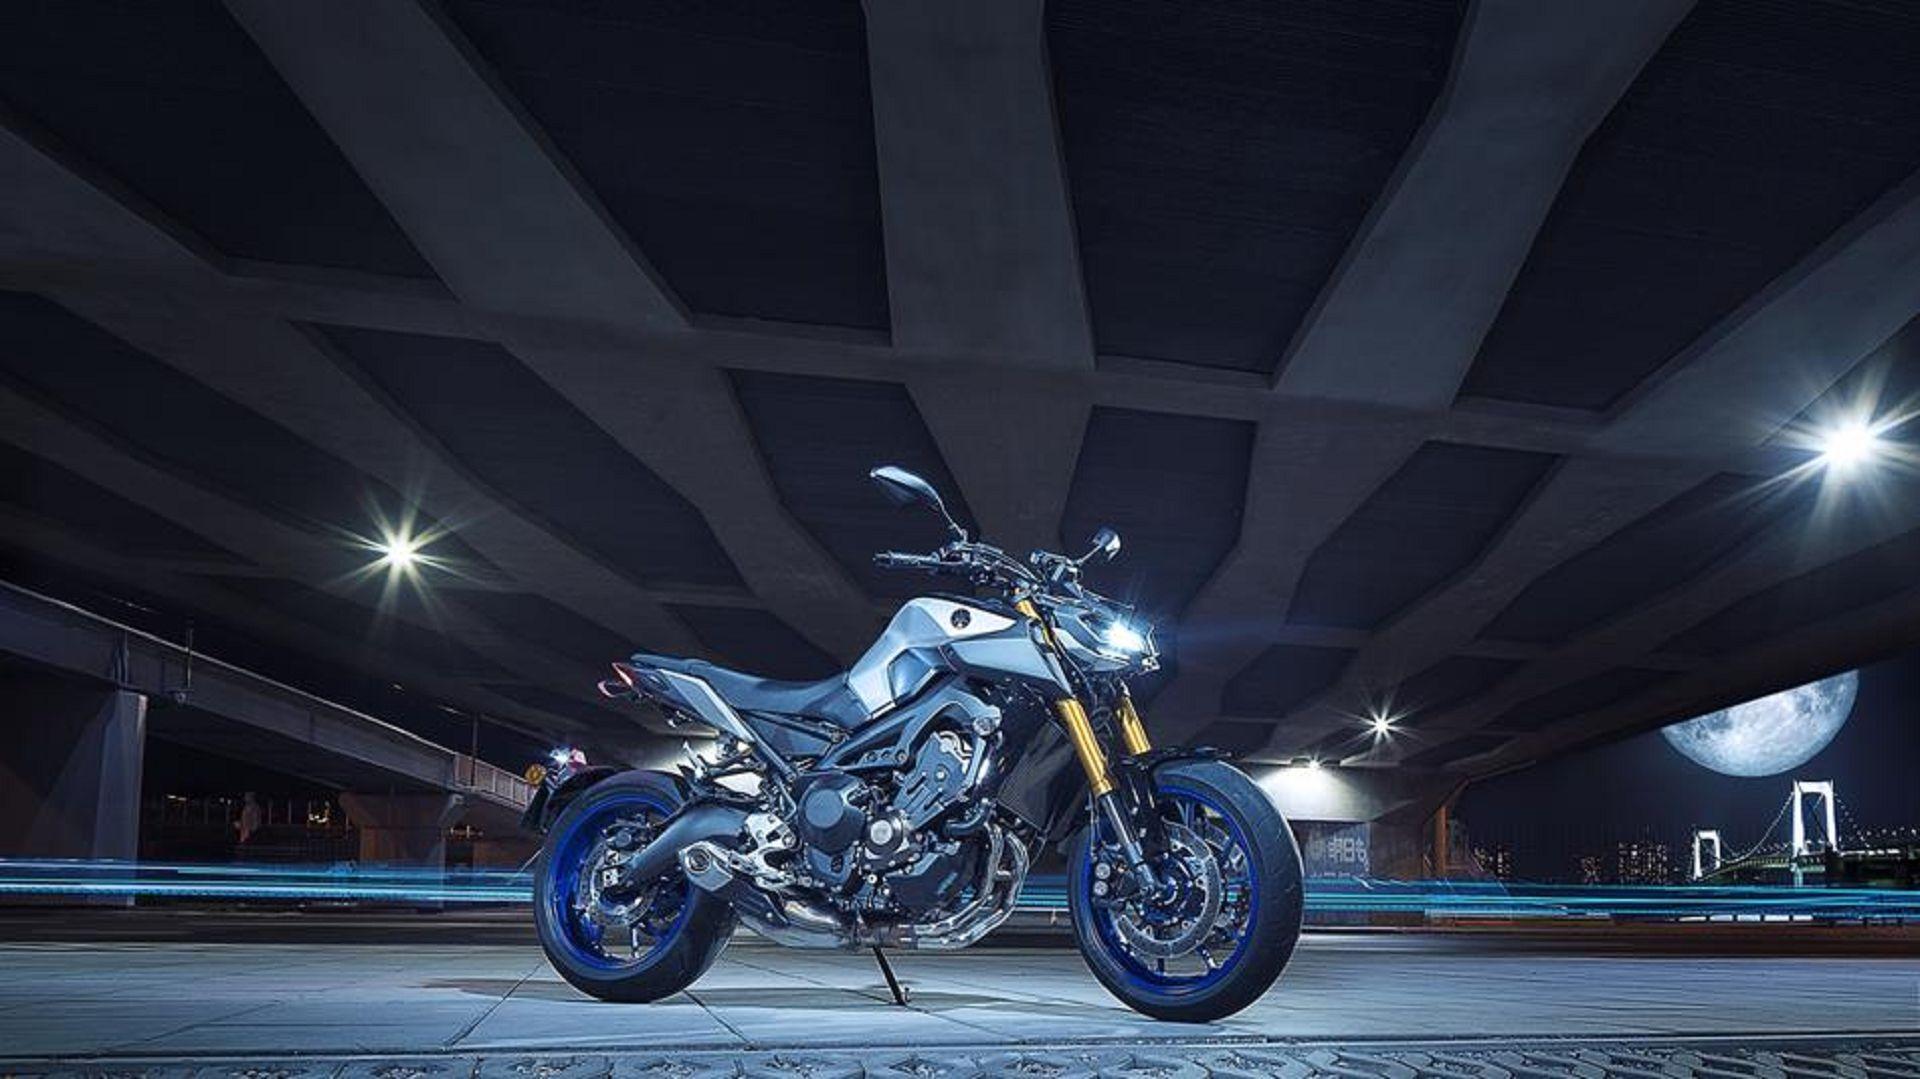 neue yamaha modelle 2018 bruno 39 s moto company. Black Bedroom Furniture Sets. Home Design Ideas